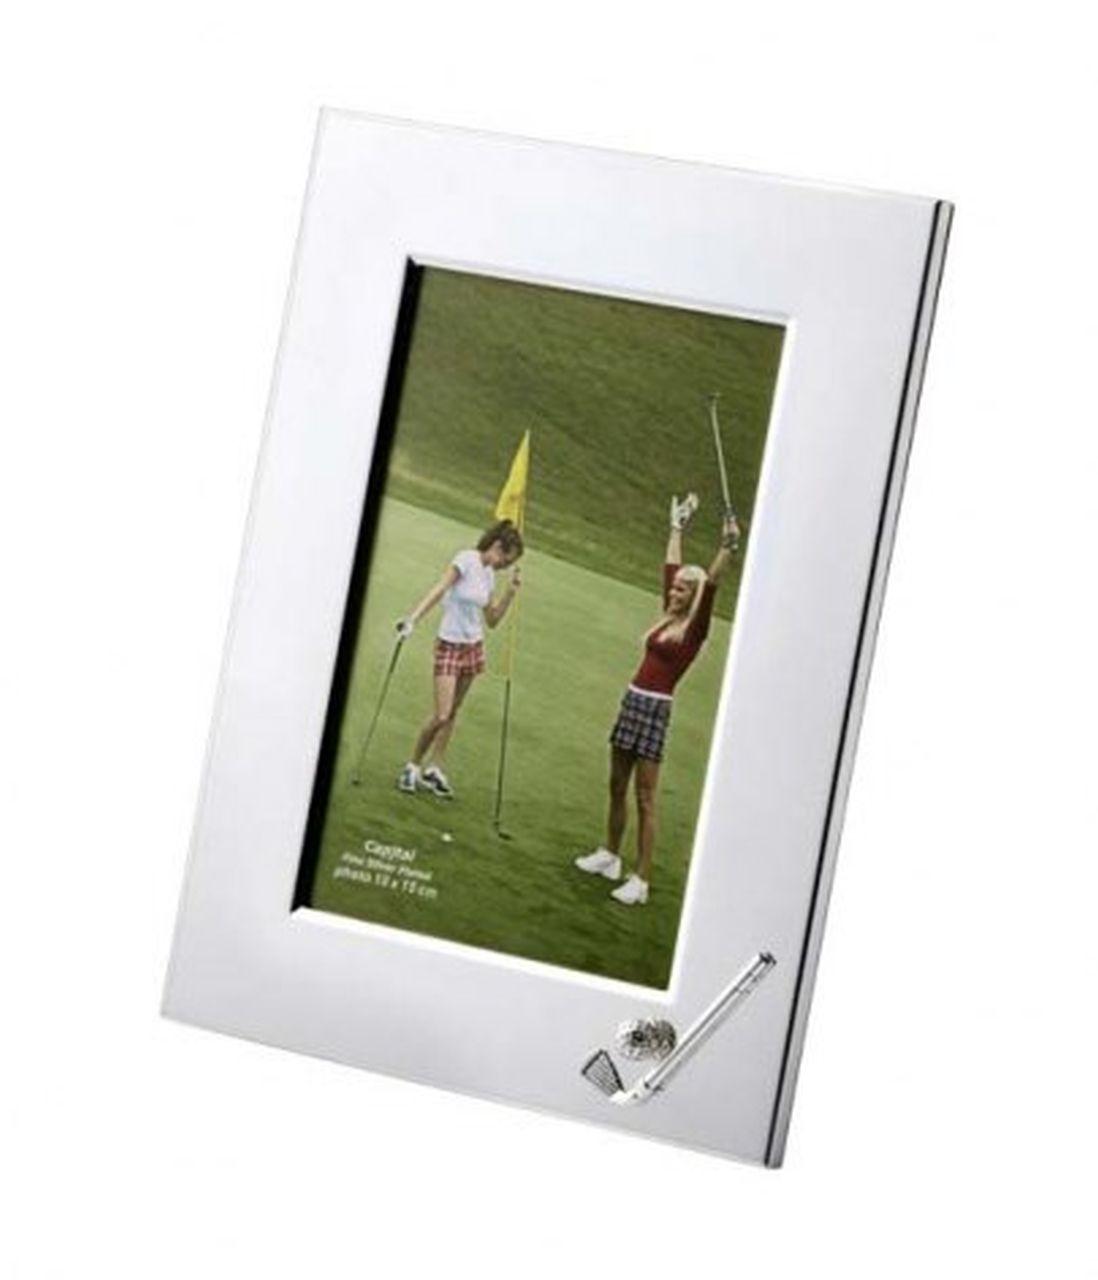 Portafoto golf in silver plated cm.20x15